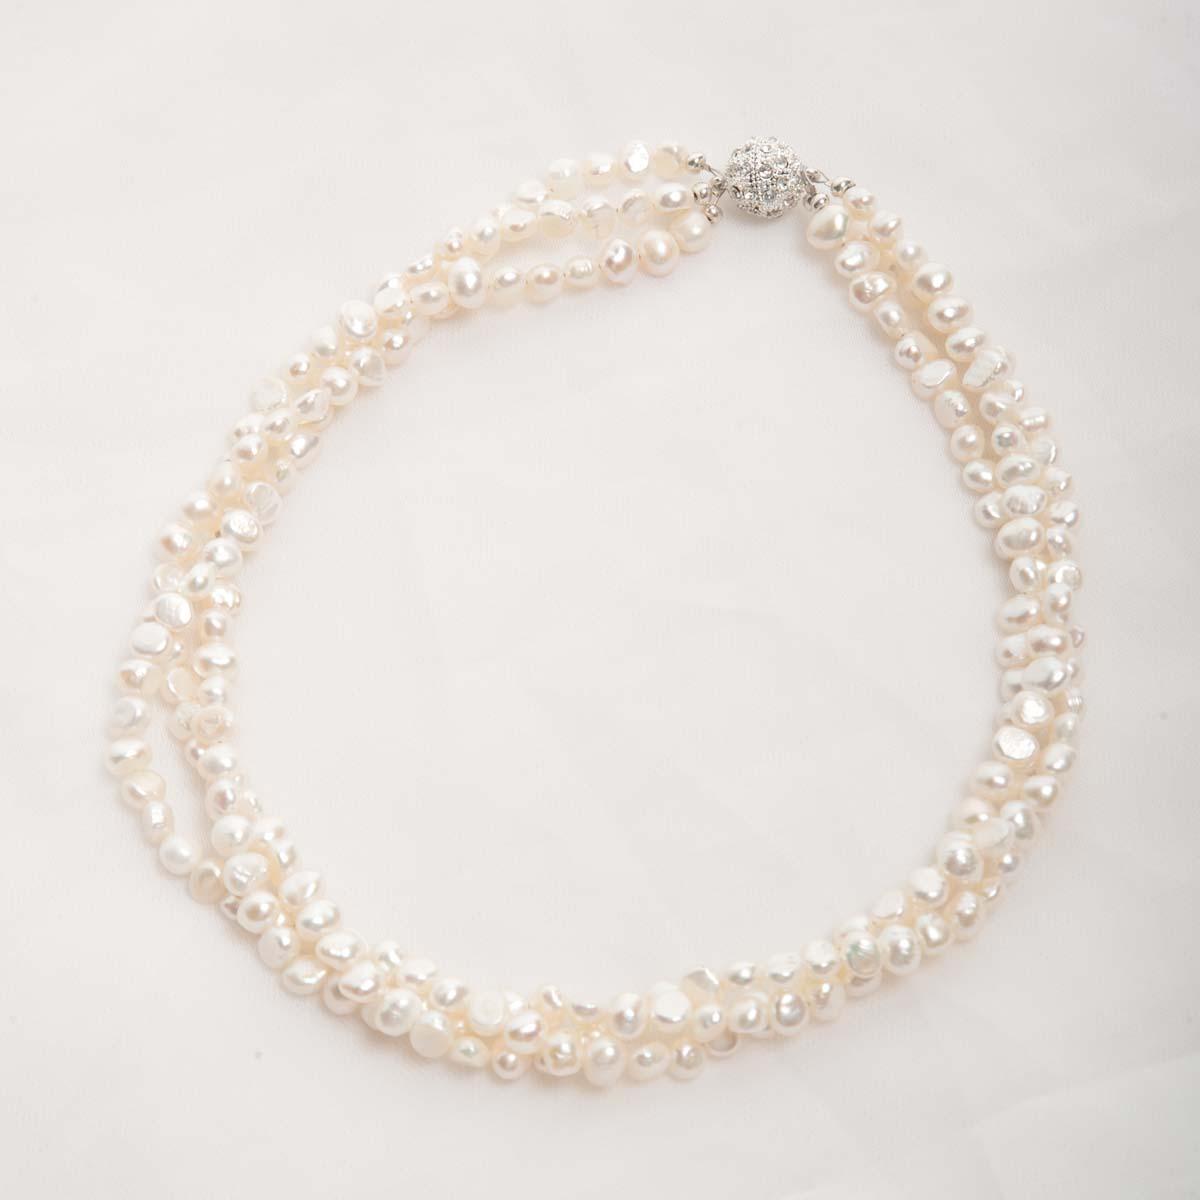 nb11 Three Strand White Freshwater Pearl Necklace Bracelet Set